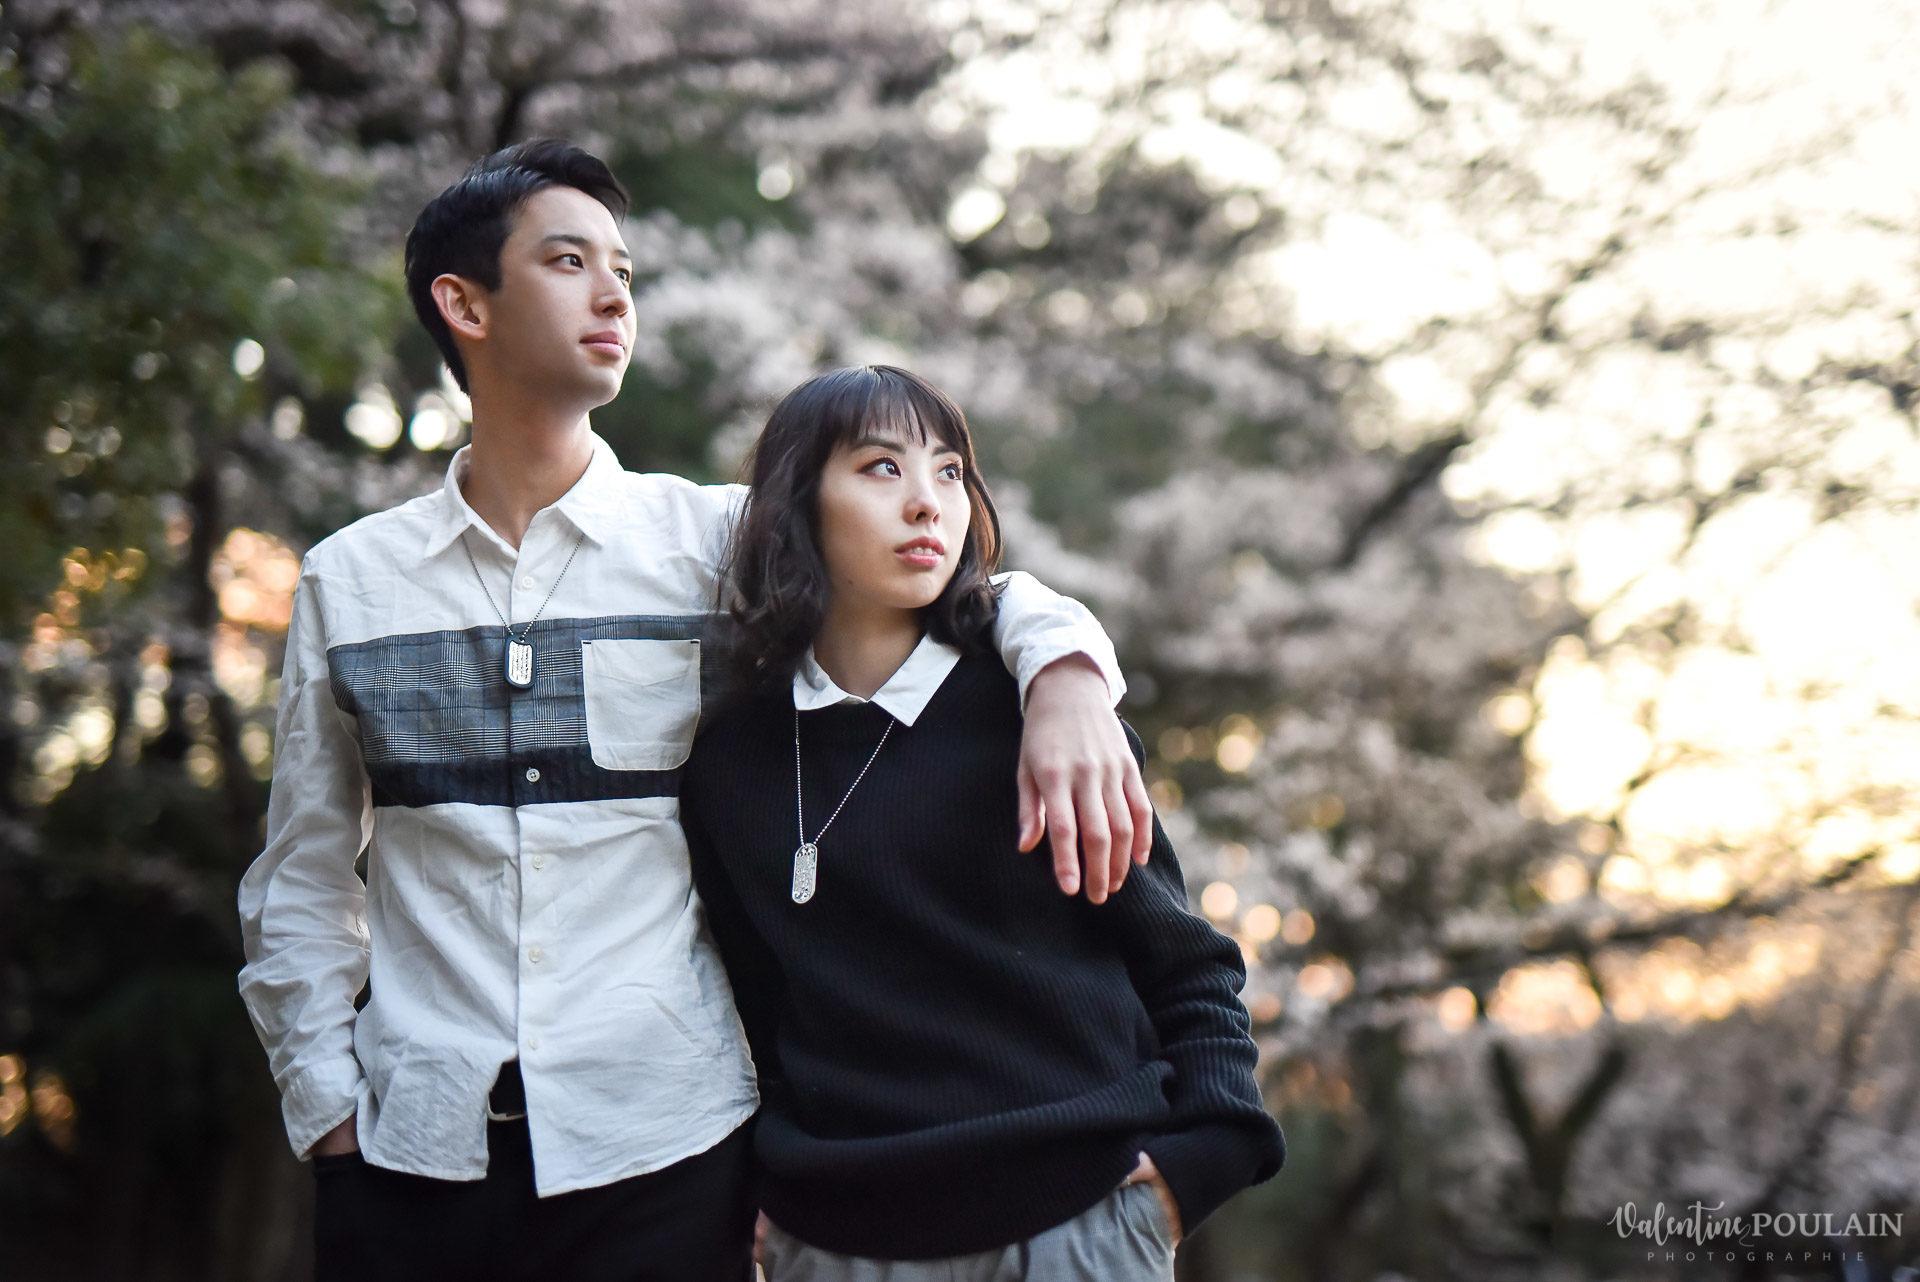 Shooting couple Japon Tokyo - Valentine Poulain sunset